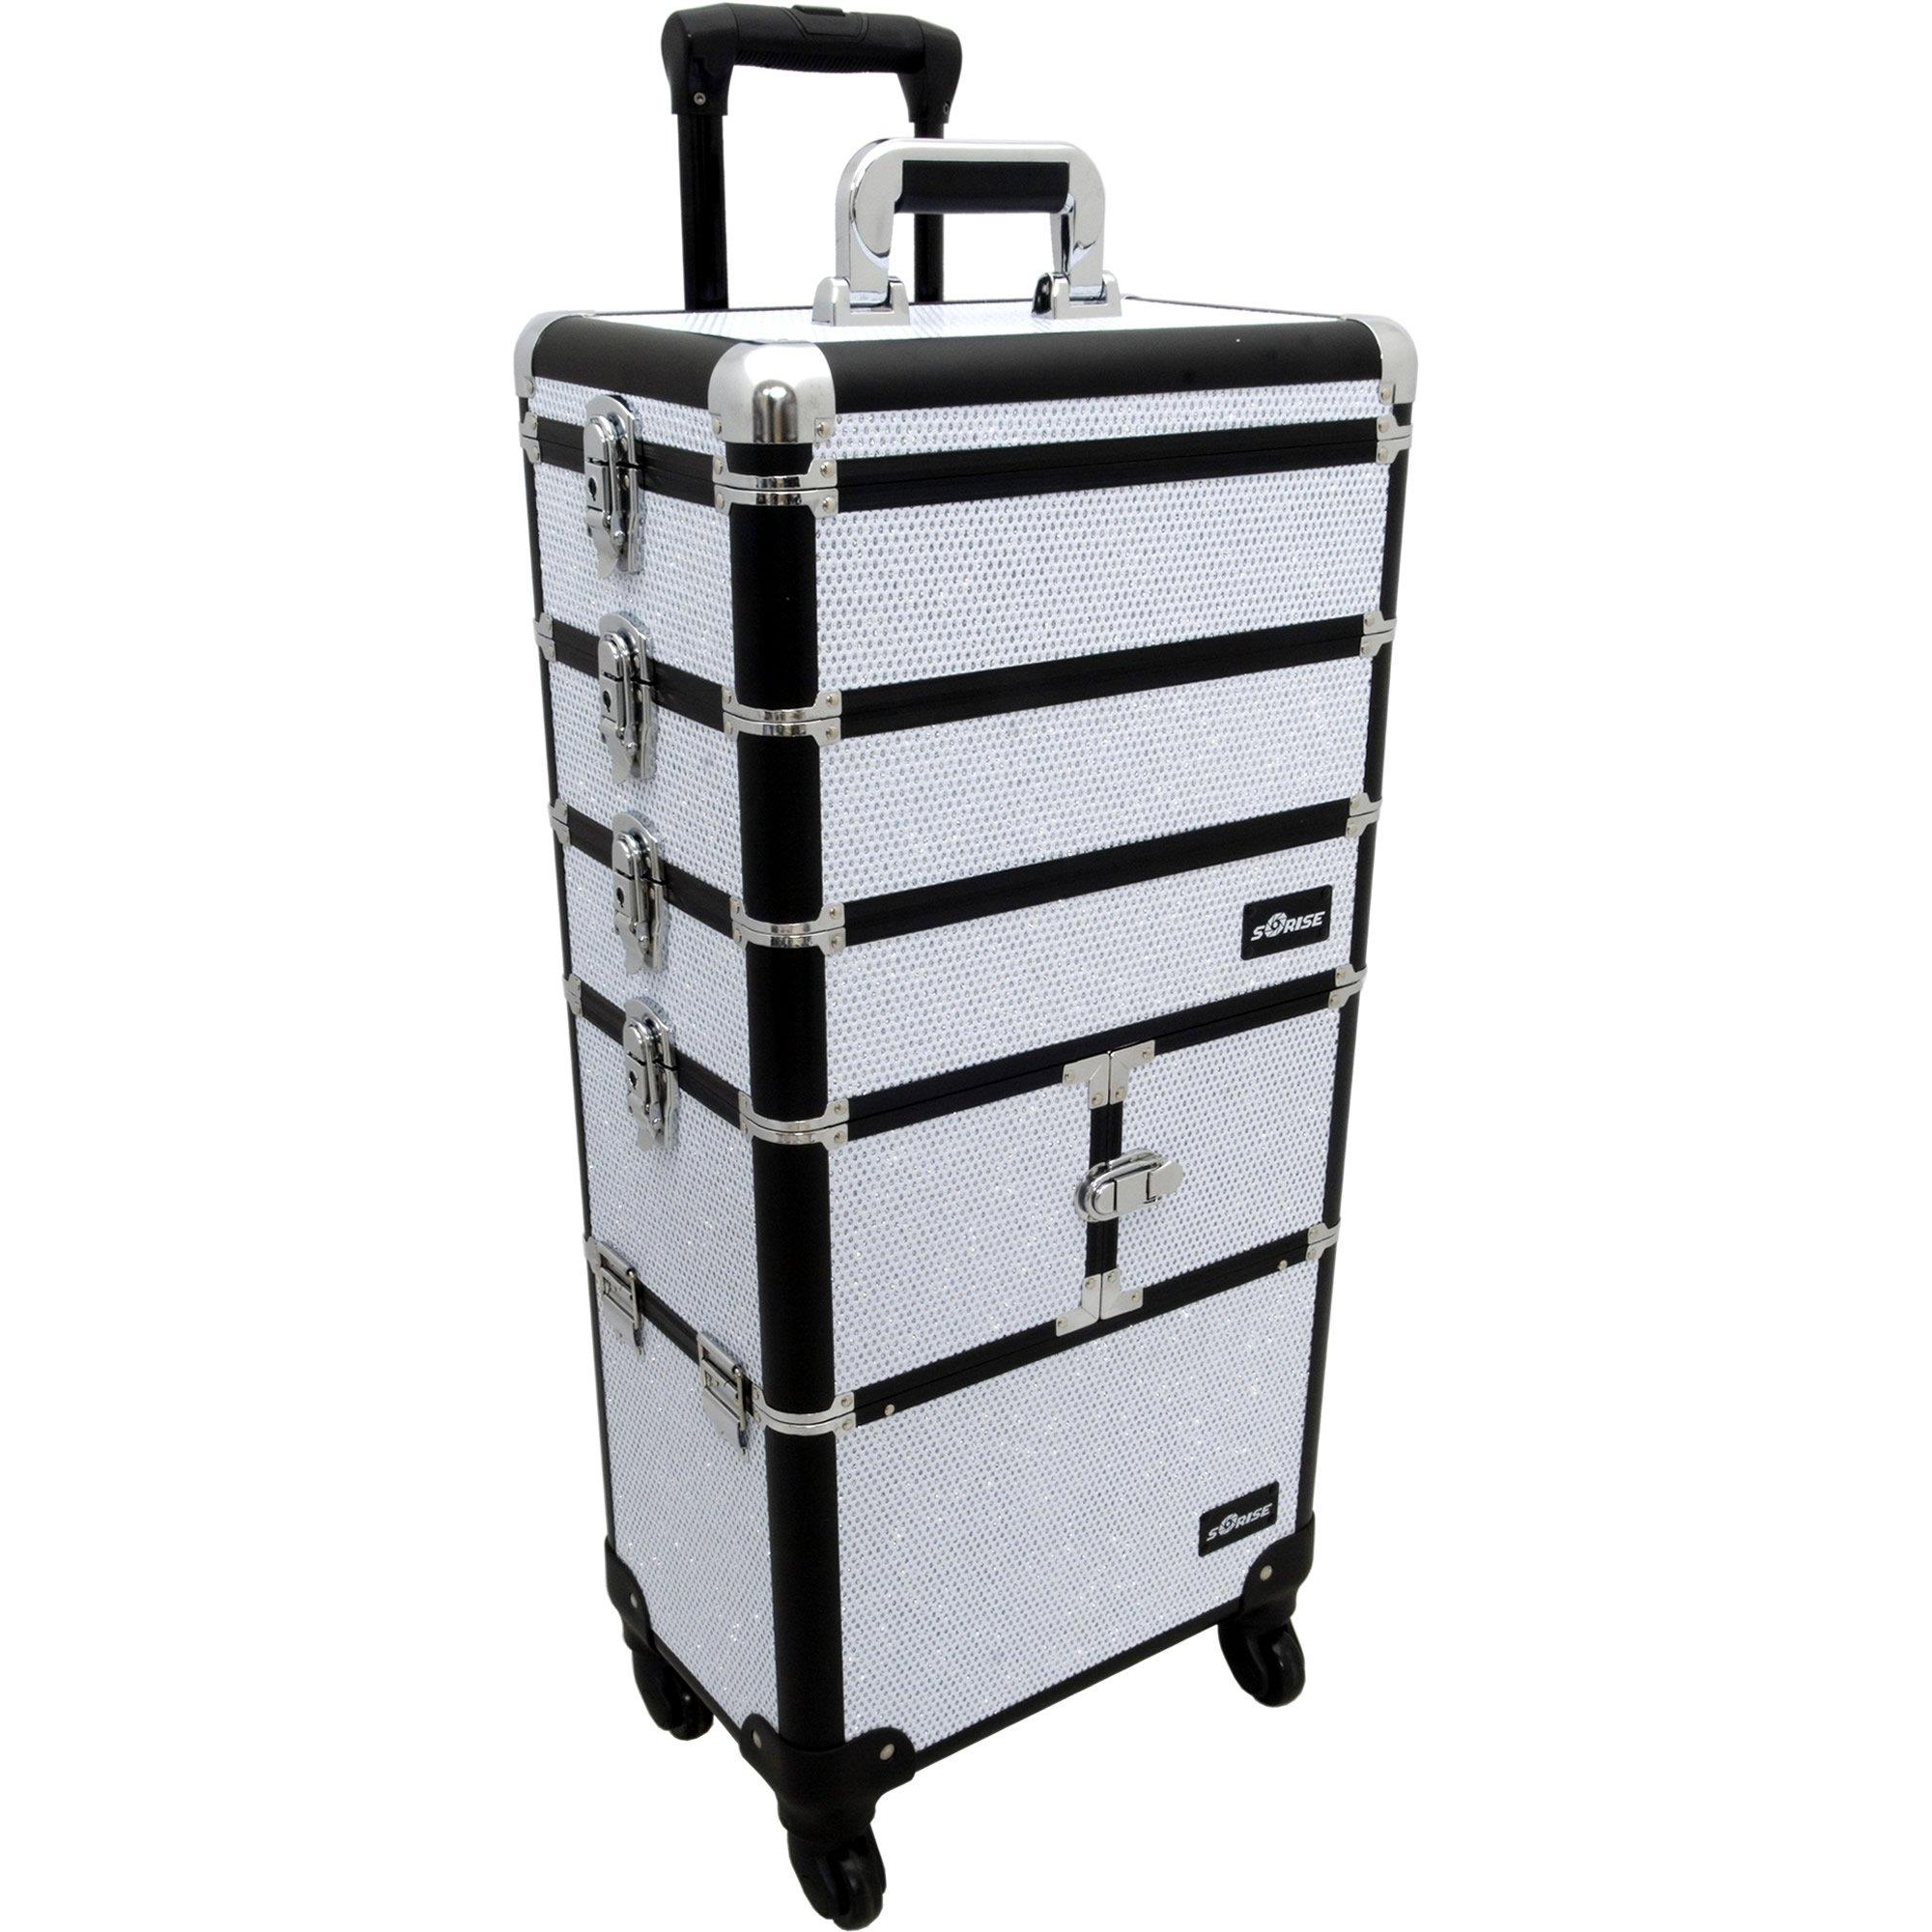 Sunrise Porto 2-In-1 Rolling Makeup Case Professional Nail Travel Organizer Box, White Krystal, 25 Pound